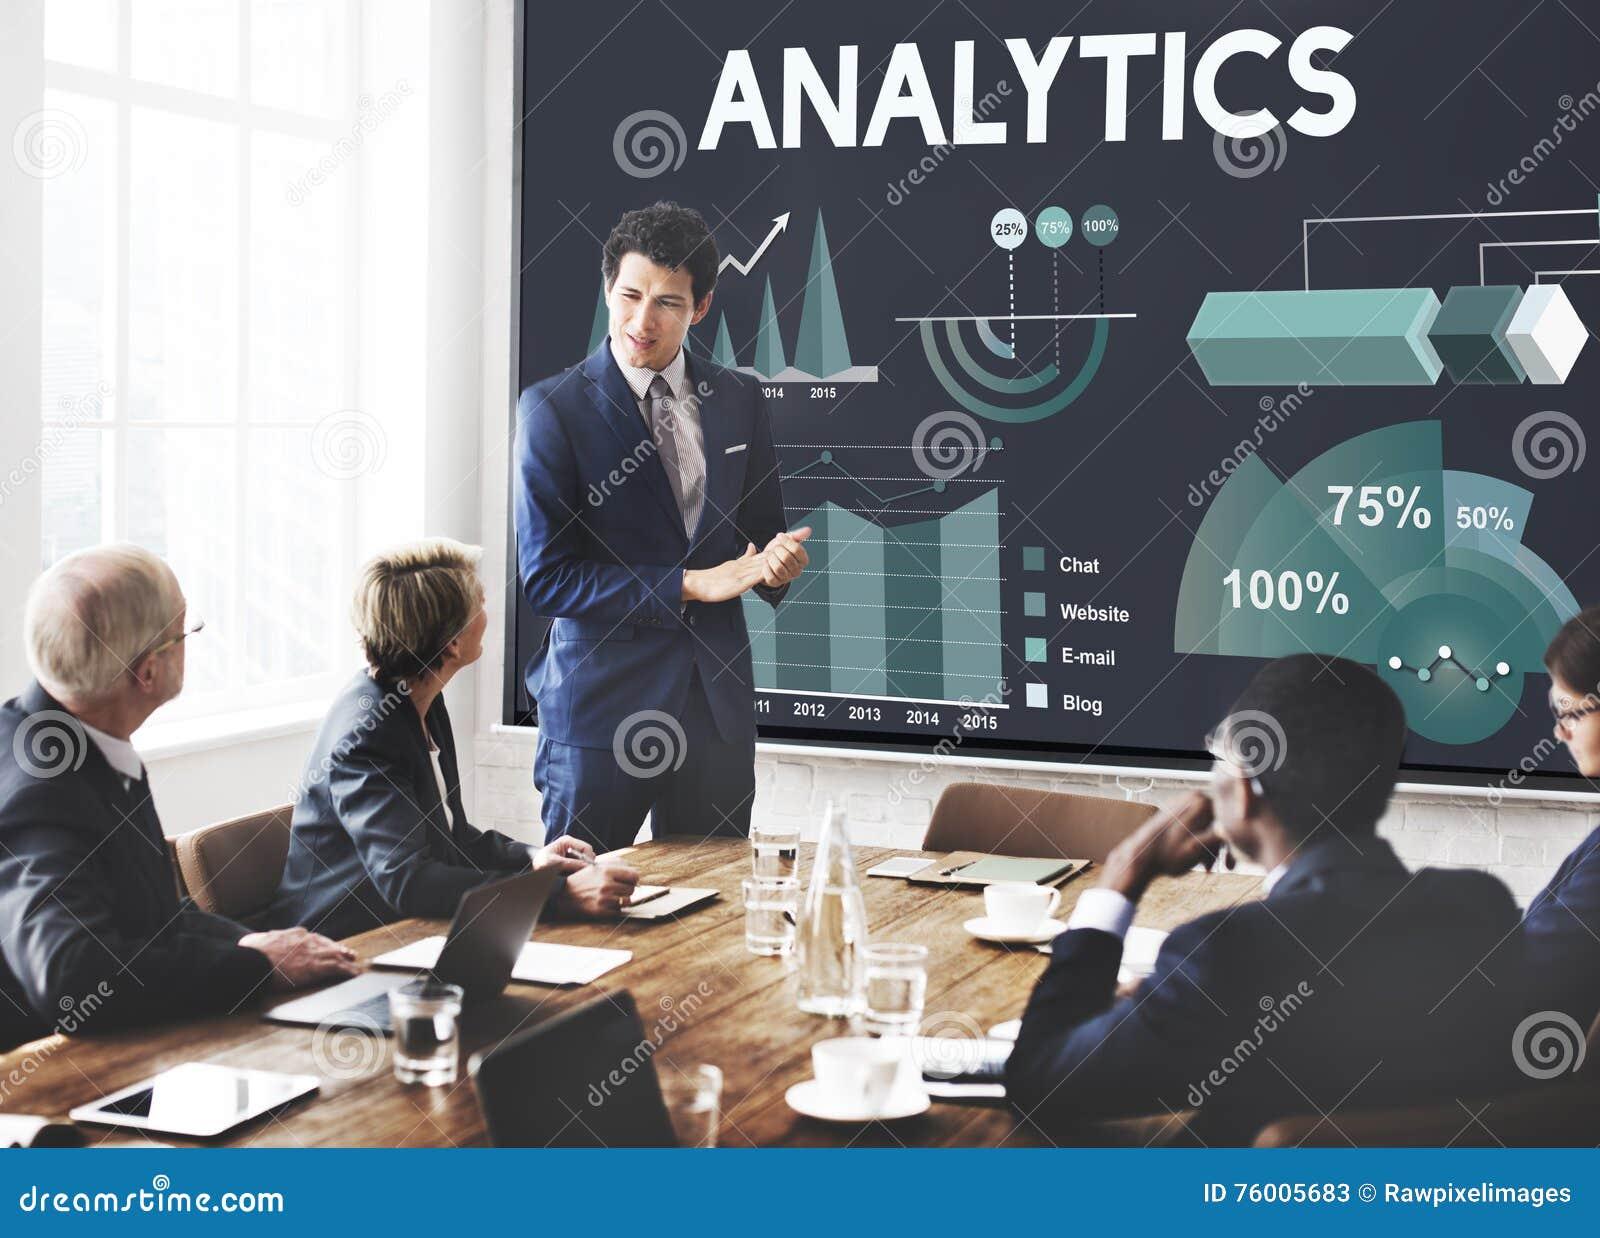 Analytics Marketing Business Report Concept Stock Image